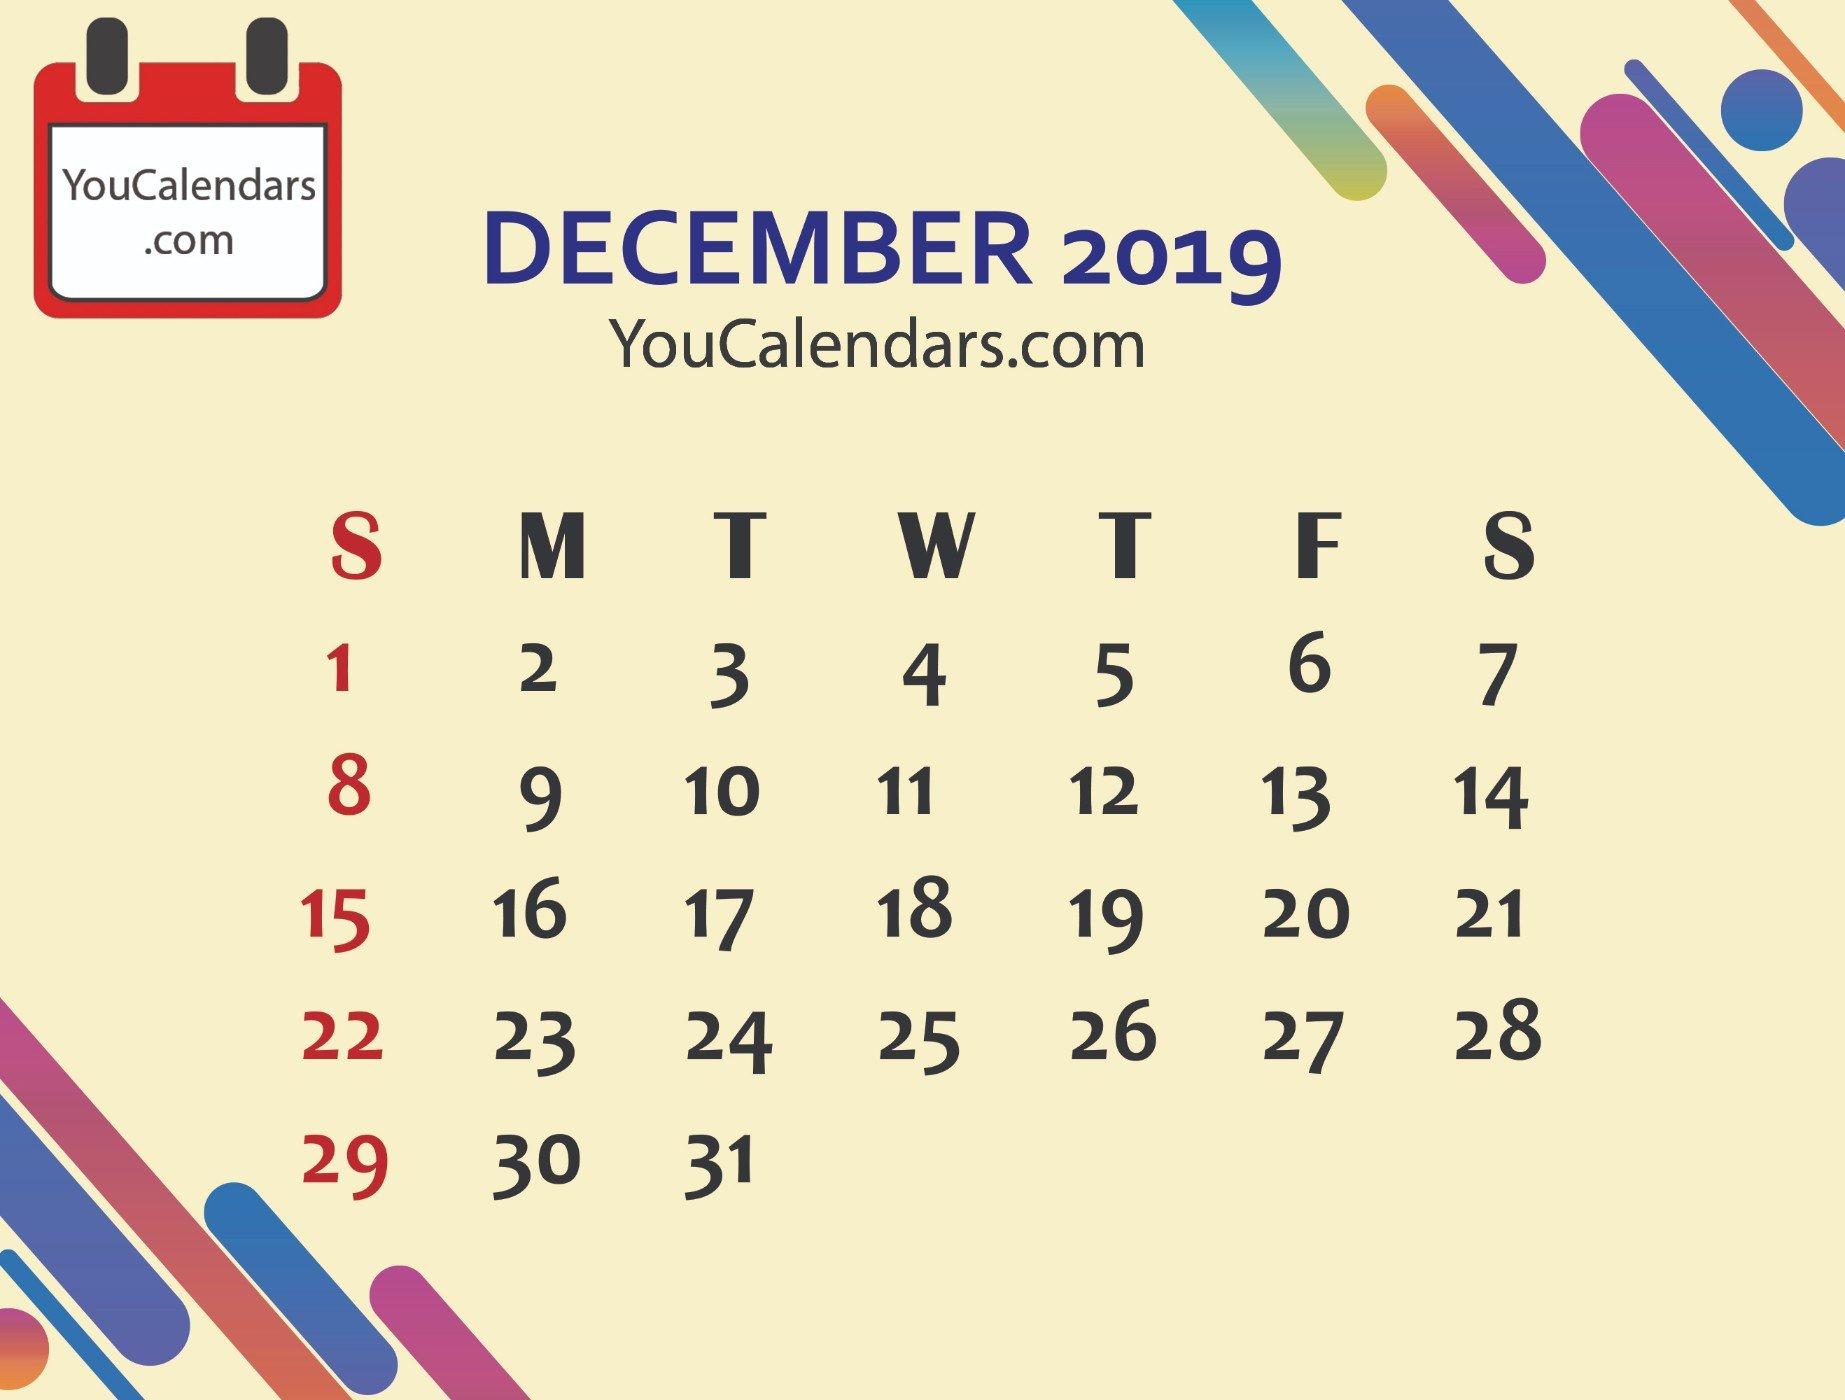 ✅Free December 2019 Calendar Printable Template - You Calendars U Of M Calendar 2019